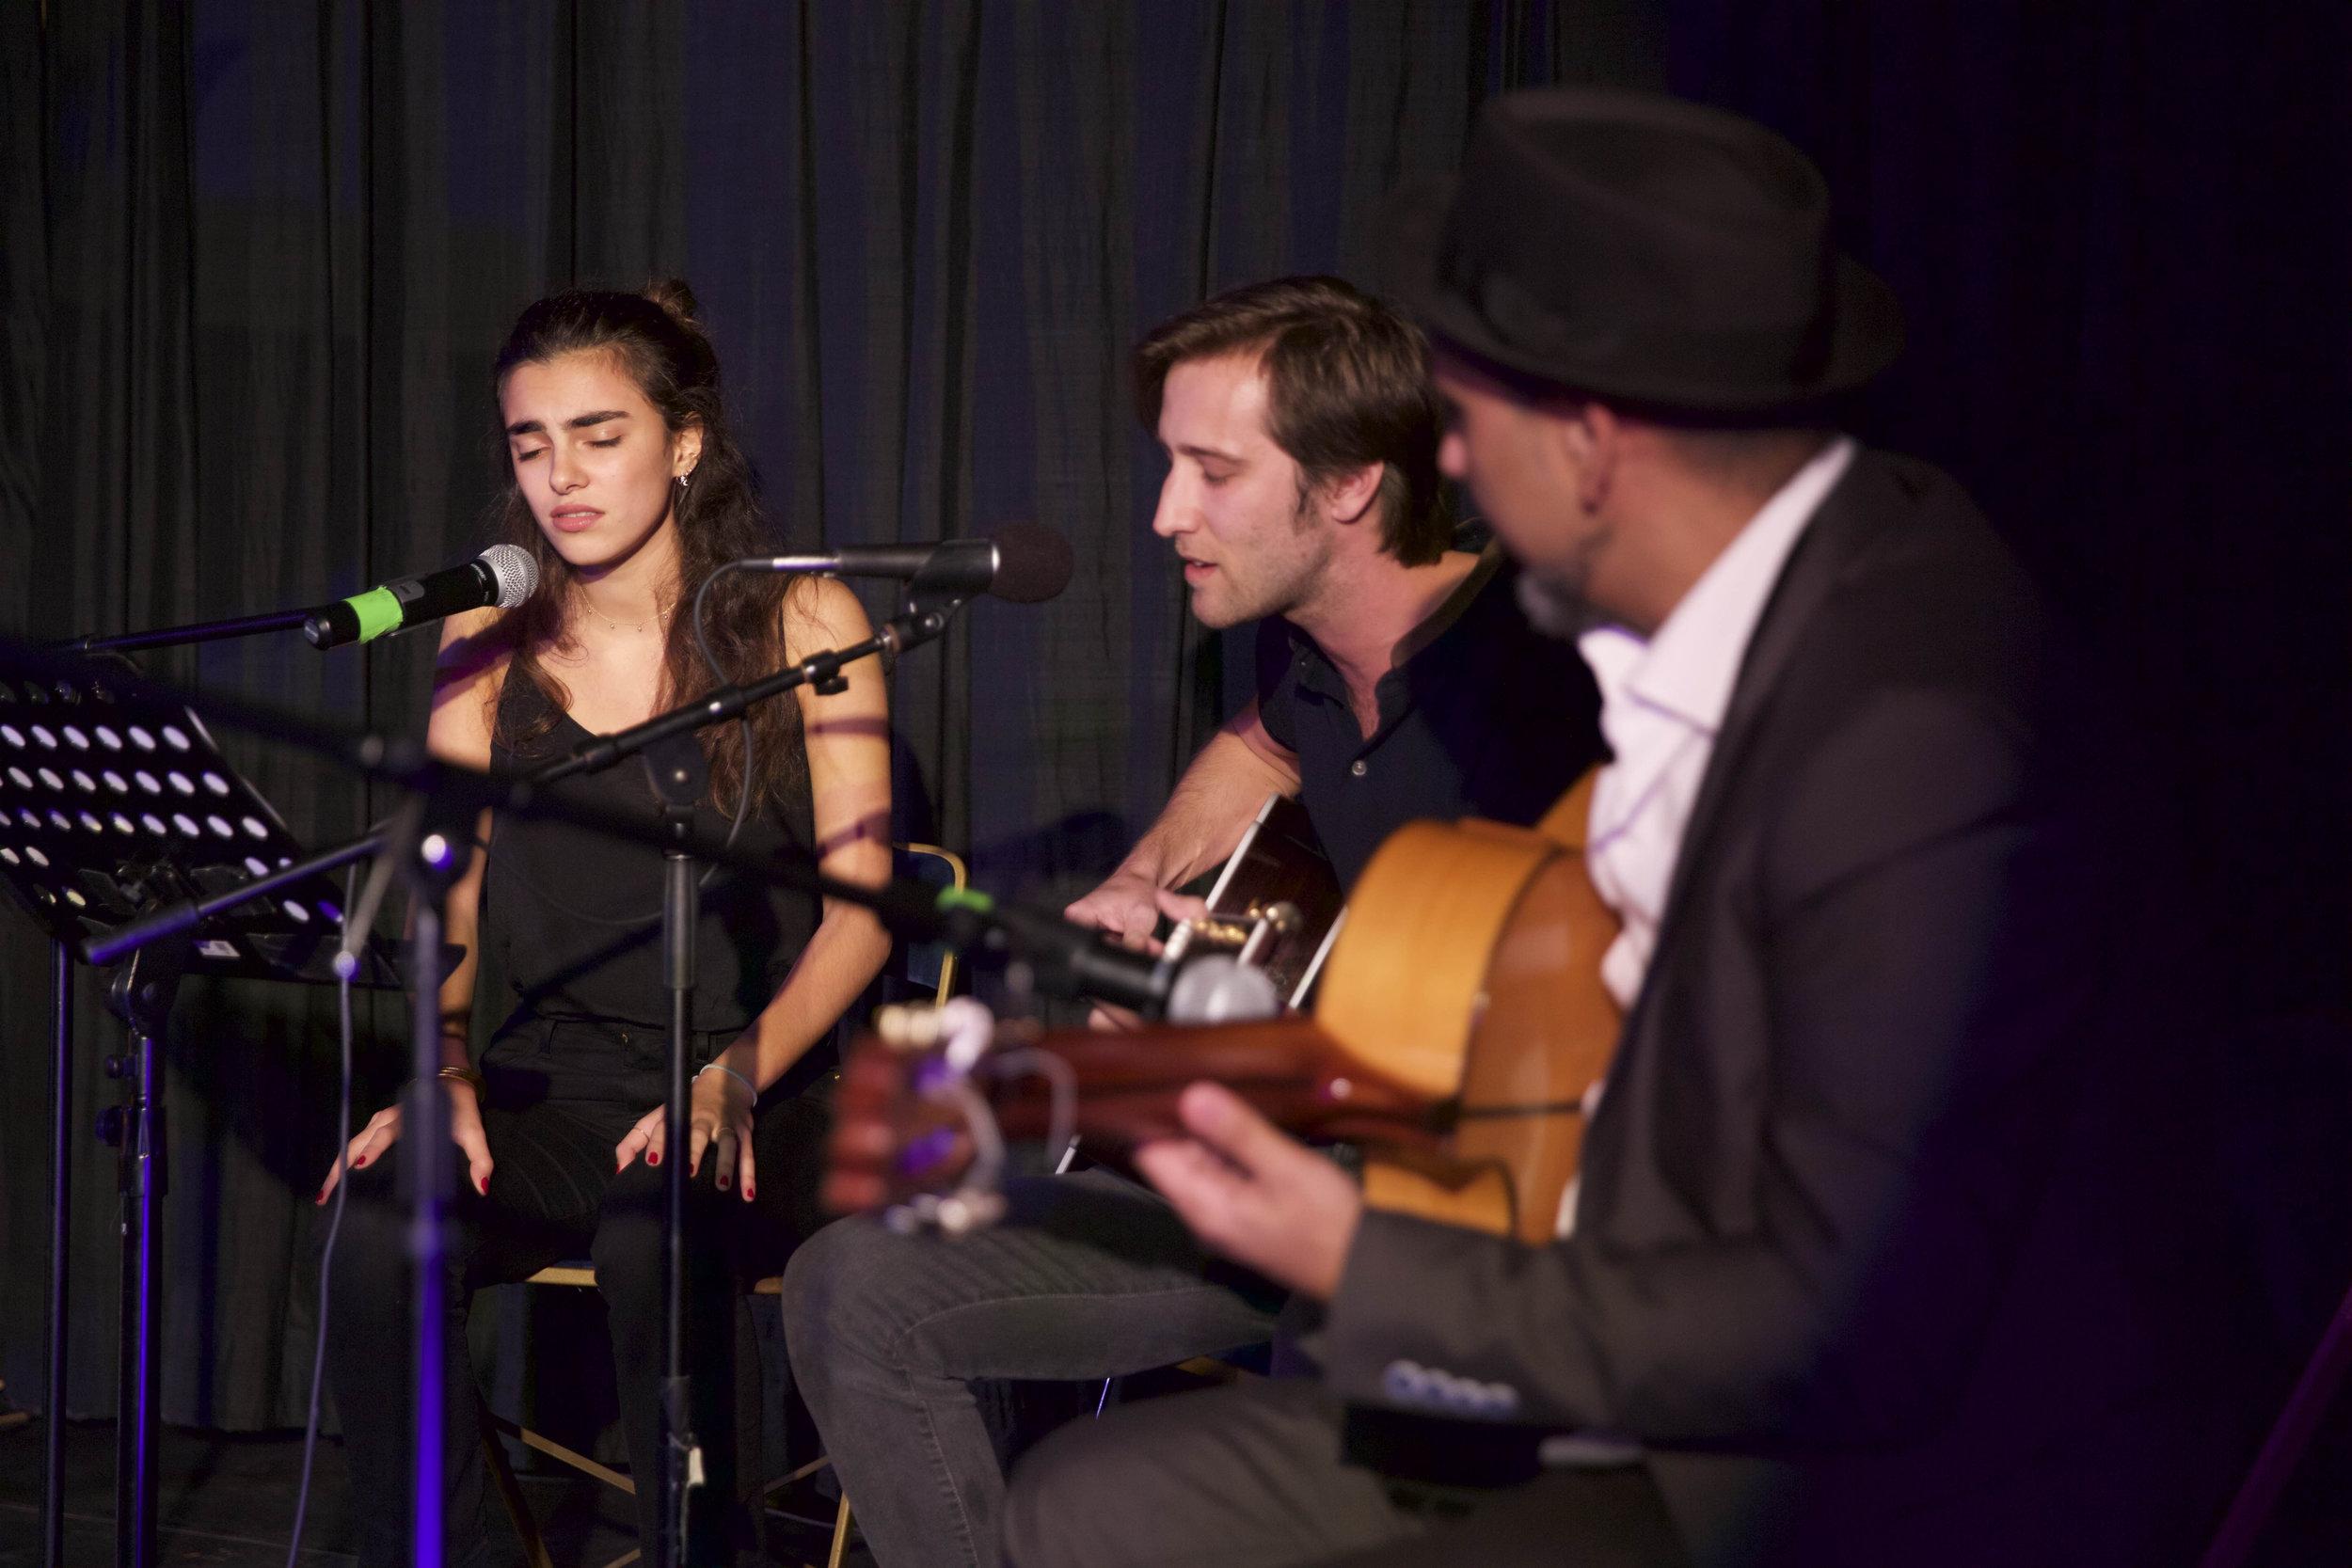 Berklee students Constance Gozlan and Victor Martín perform with guitarist Rycardo Moreno during the Berklee Meets Lorca concert. Instituto Cervantes, Oct 18.